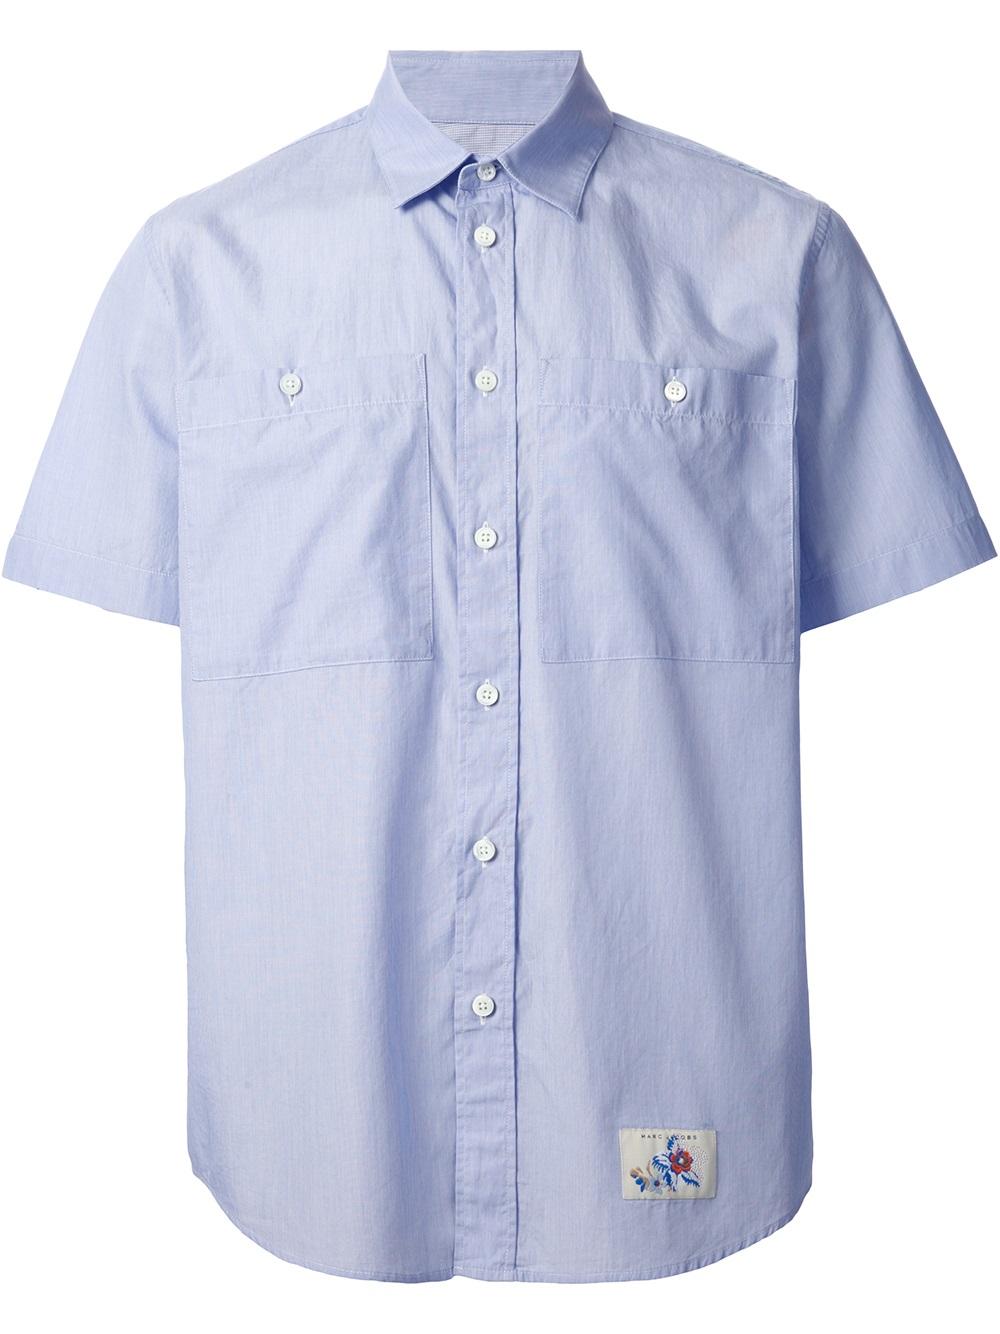 Marc Jacobs Pocket Detail Short Sleeve Shirt In Blue For